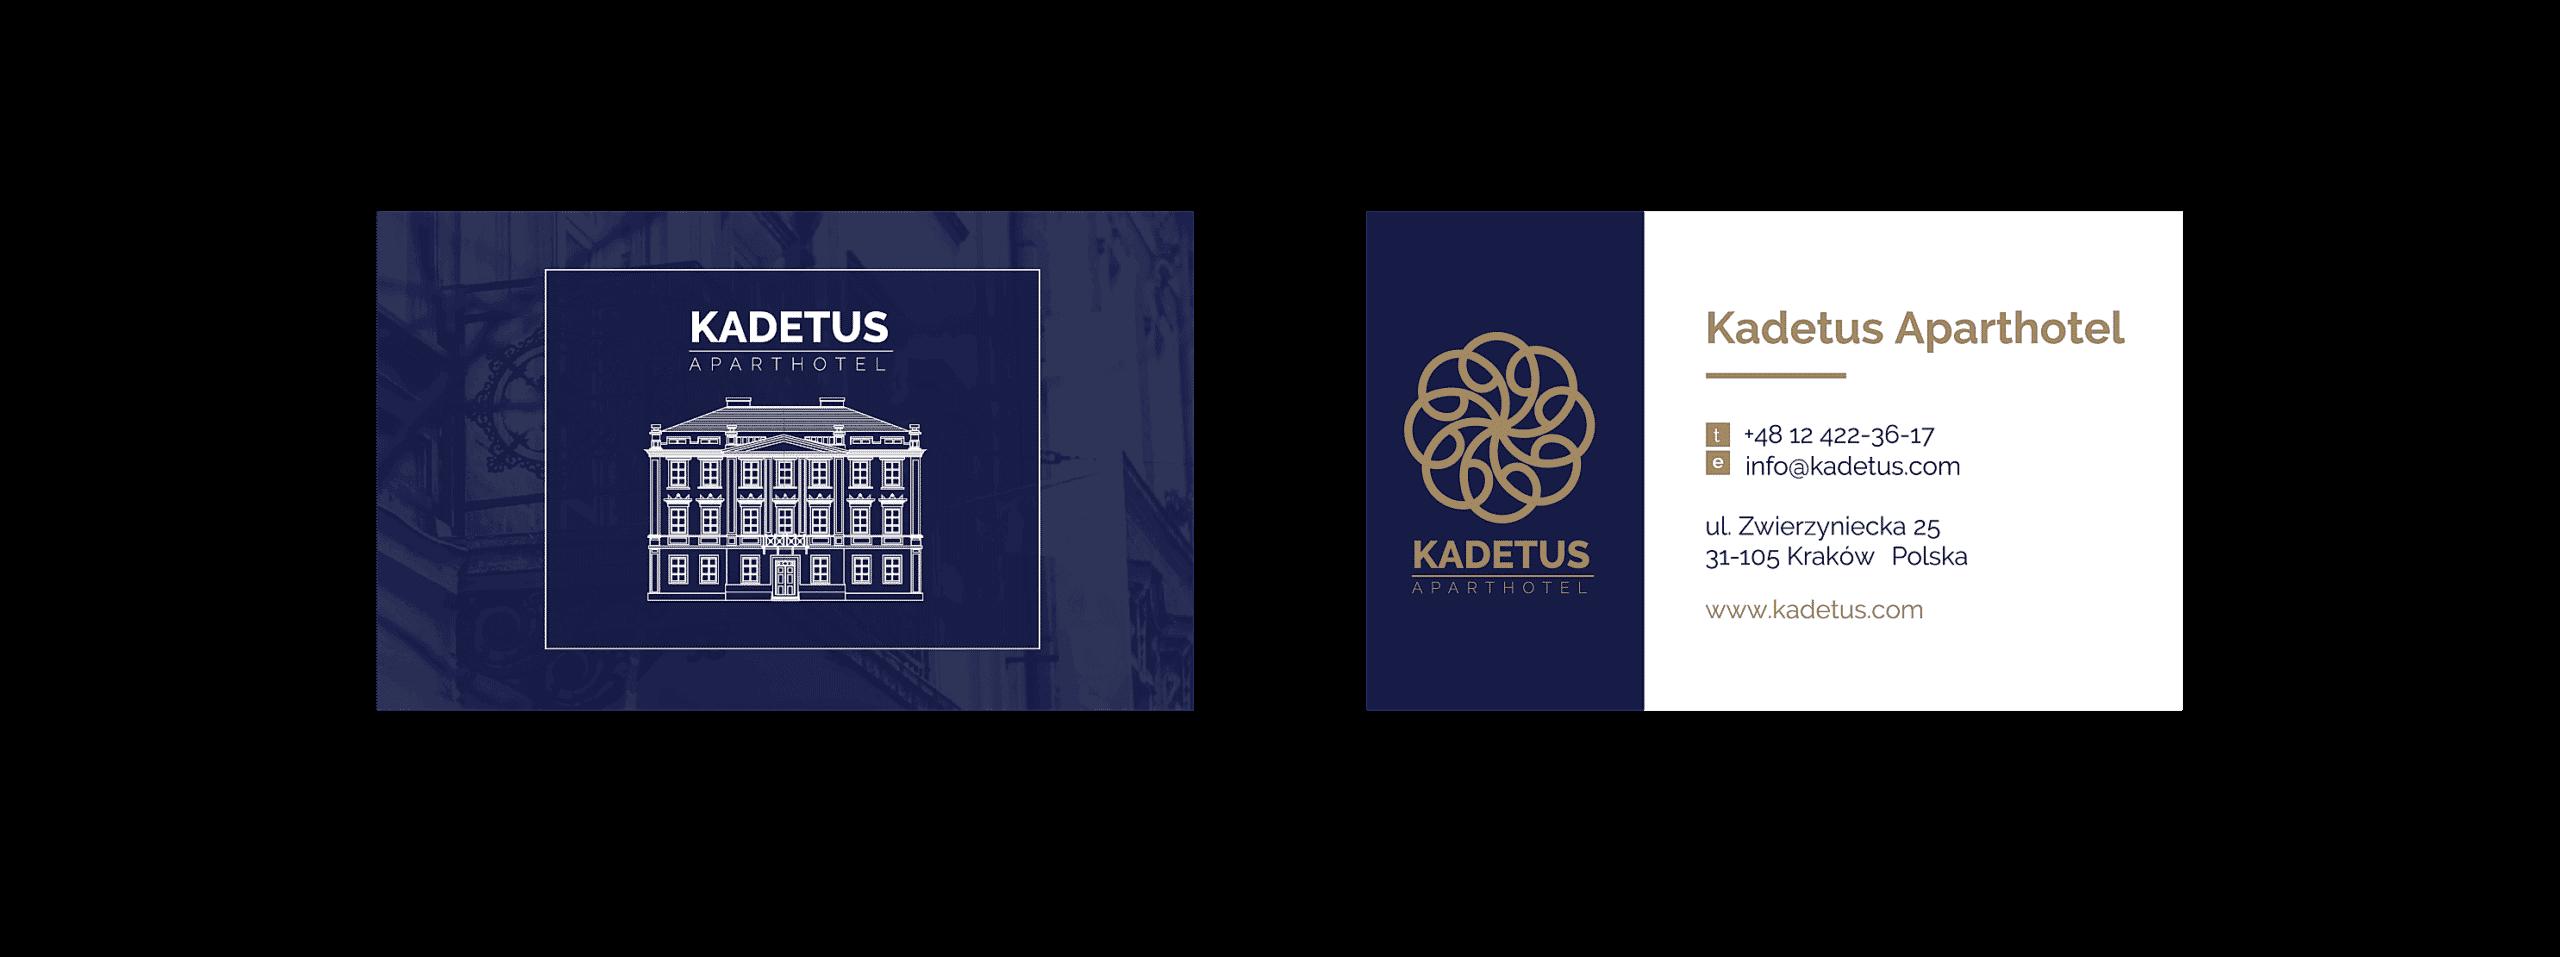 HELT-PORTFOLIO-KADETUS APARTHOTEL-editorial